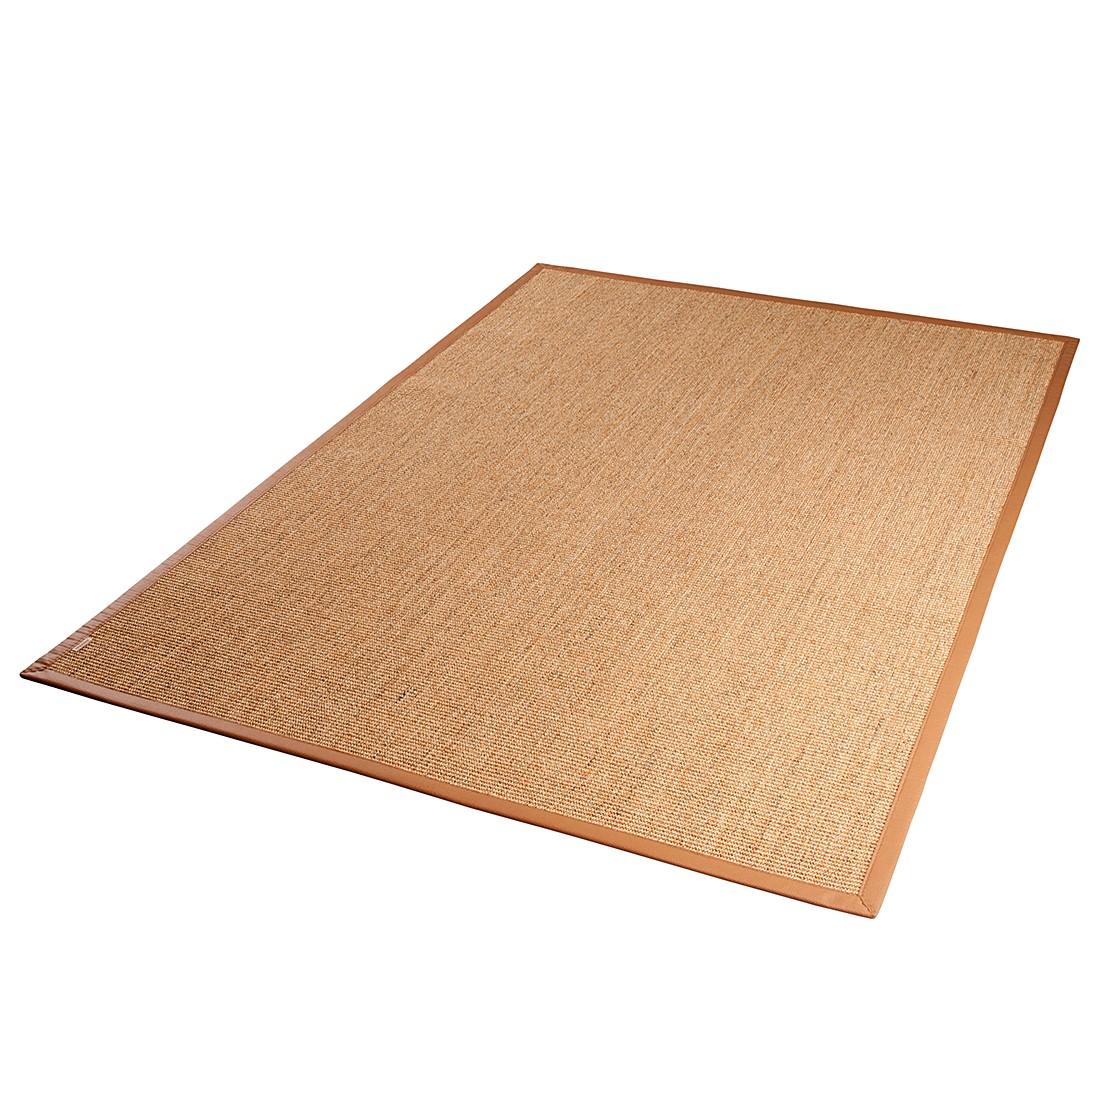 Teppich Mara A1 – Kastanienbraun – 170 x 230 cm, DEKOWE günstig